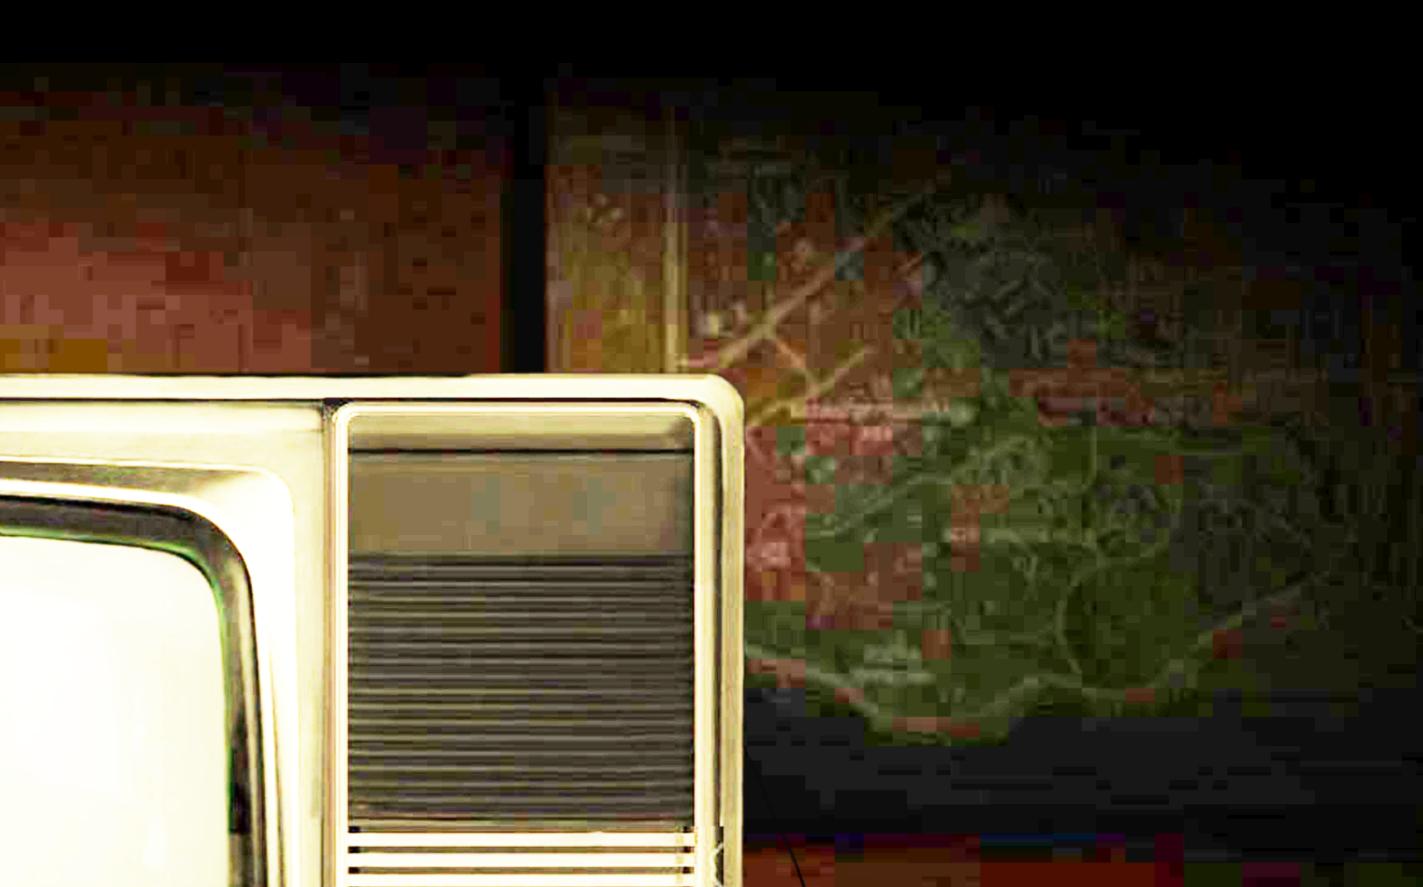 Call of Duty Black Ops Cold War easter egg Verdansk map